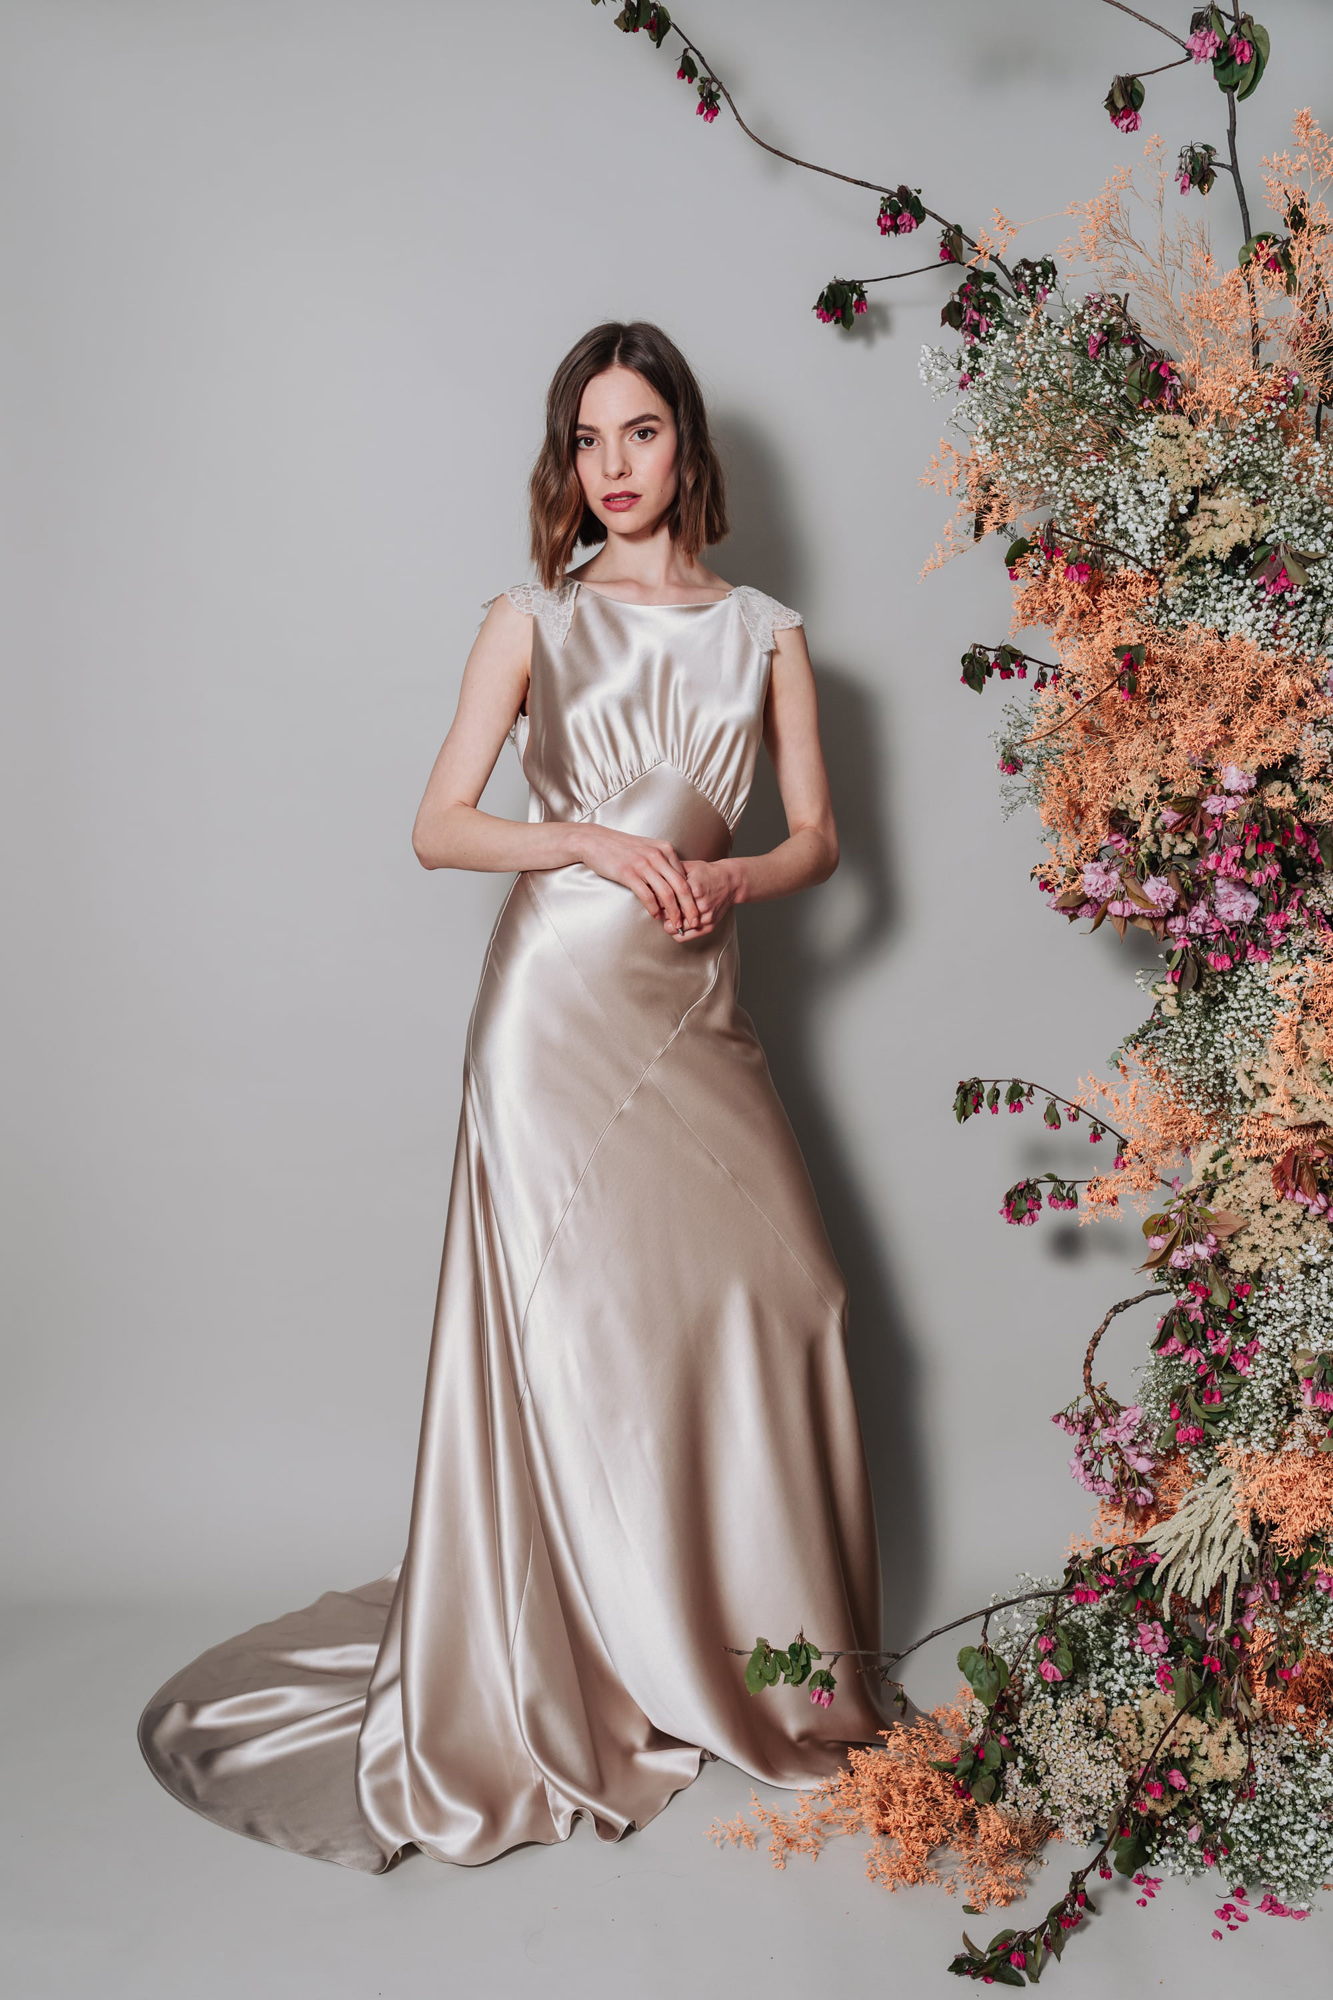 Kate-Beaumont-Sheffield-Honeysuckle-Bias-Cut-Silk-Panelled-Wedding-Gown-2.jpg